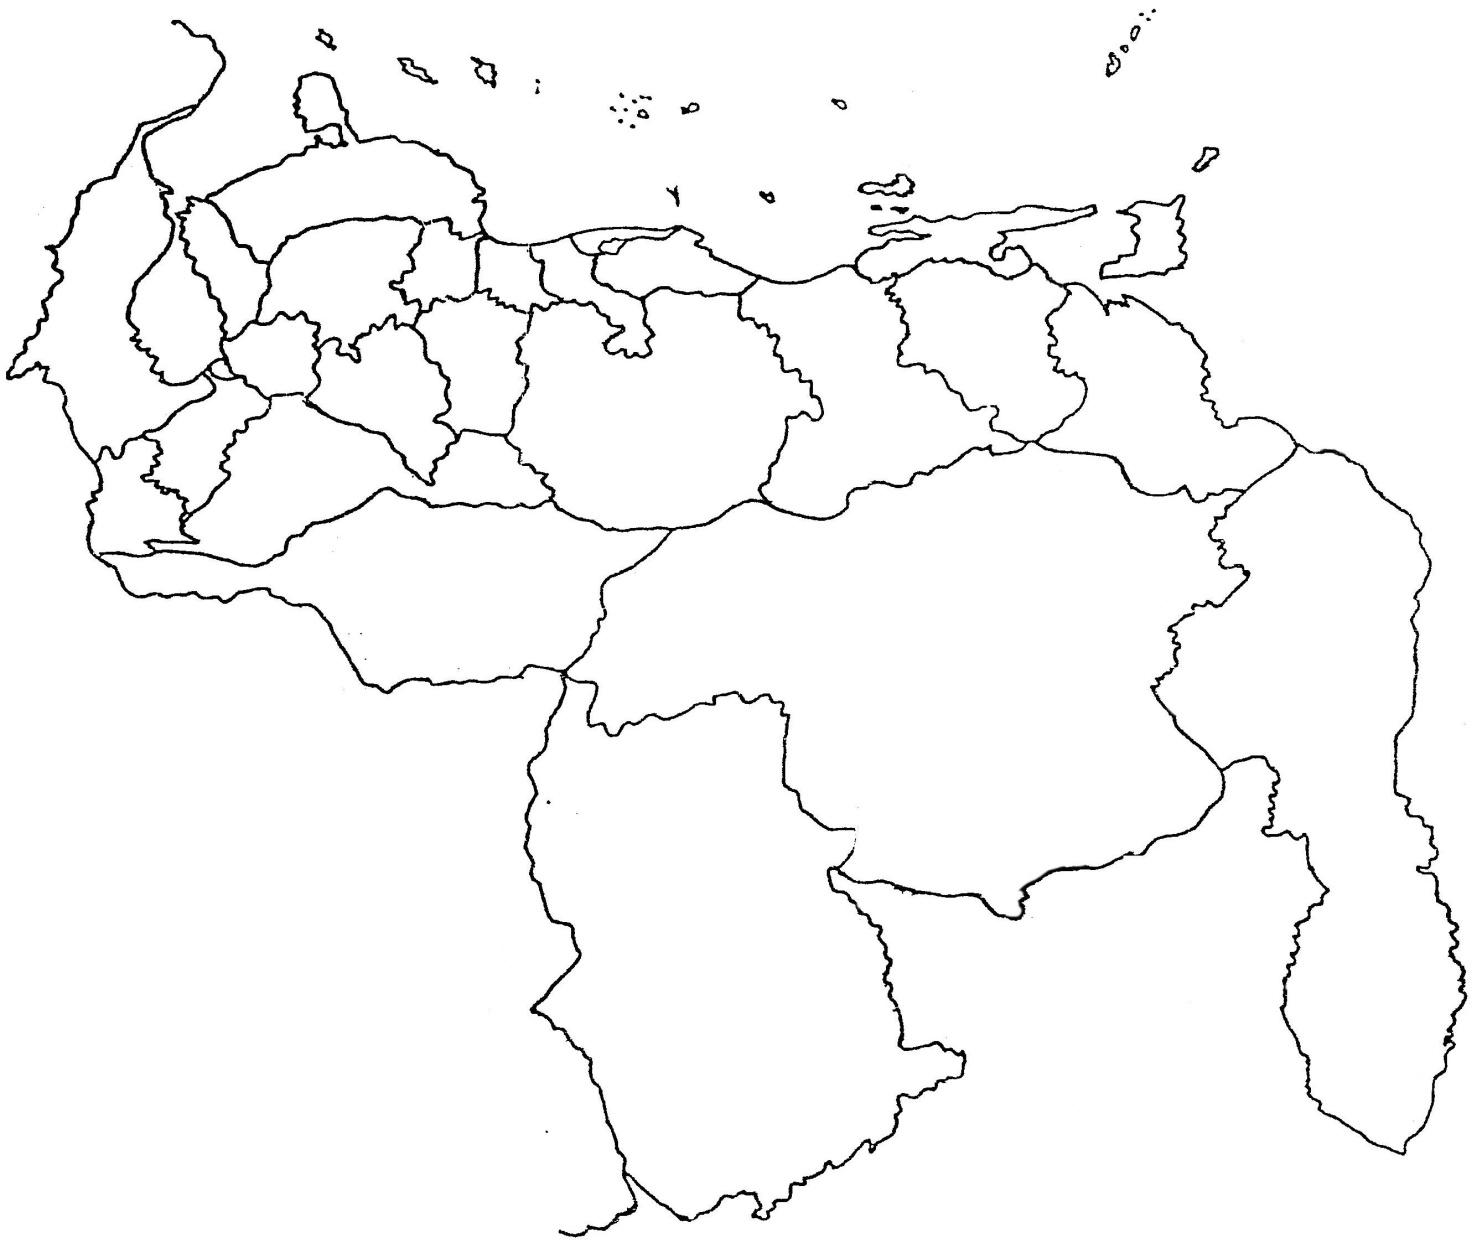 Mapa de Venezuela para colorear - Imagui